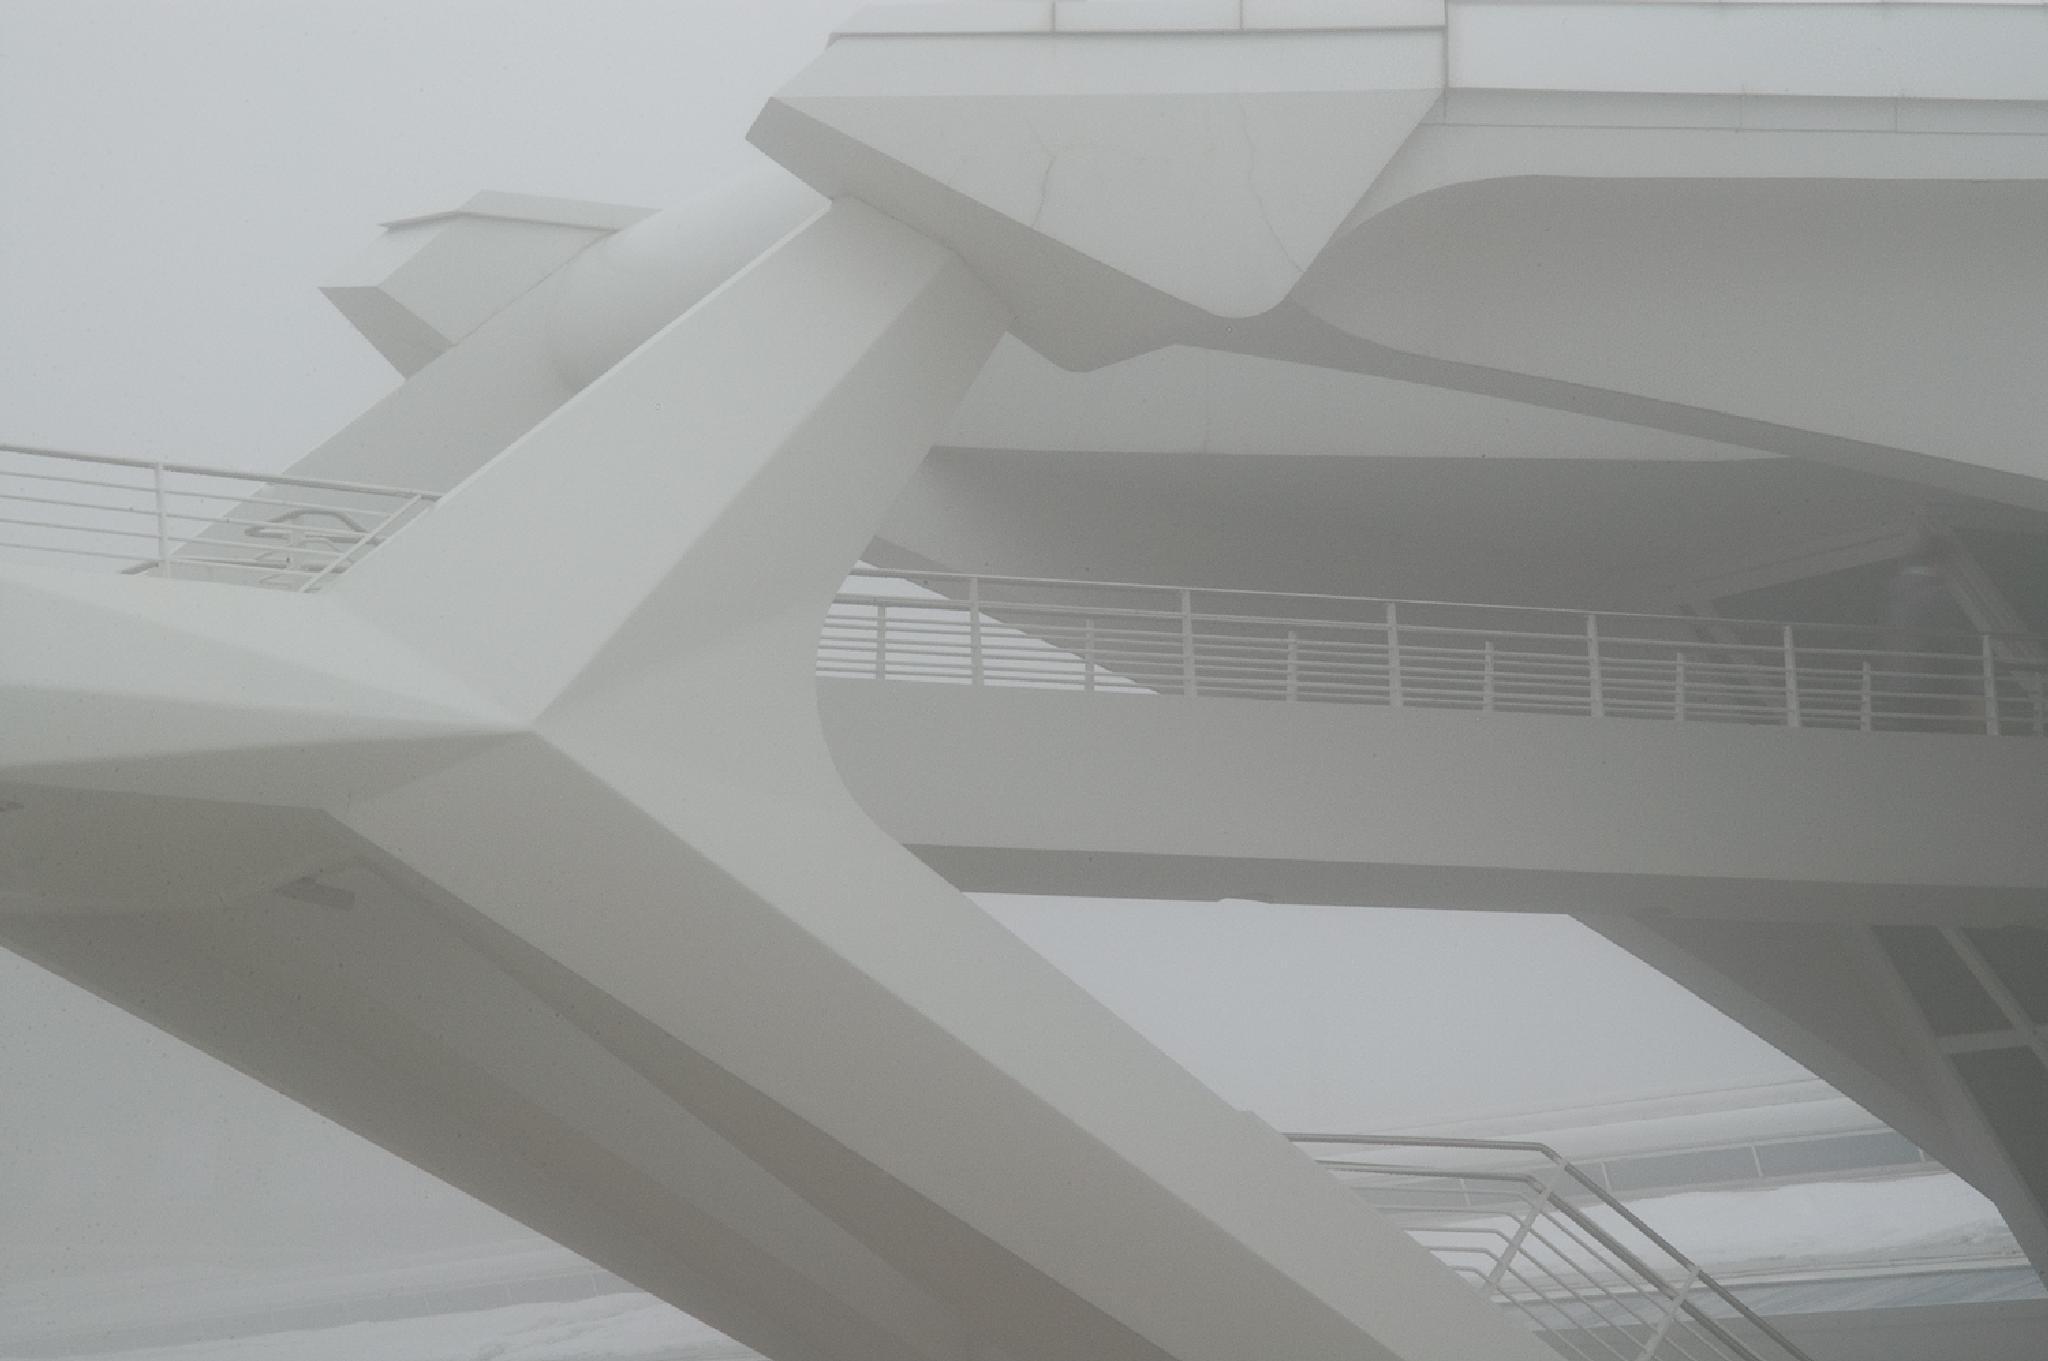 Milwaukee Art Museum, Fog by William Rieselbach